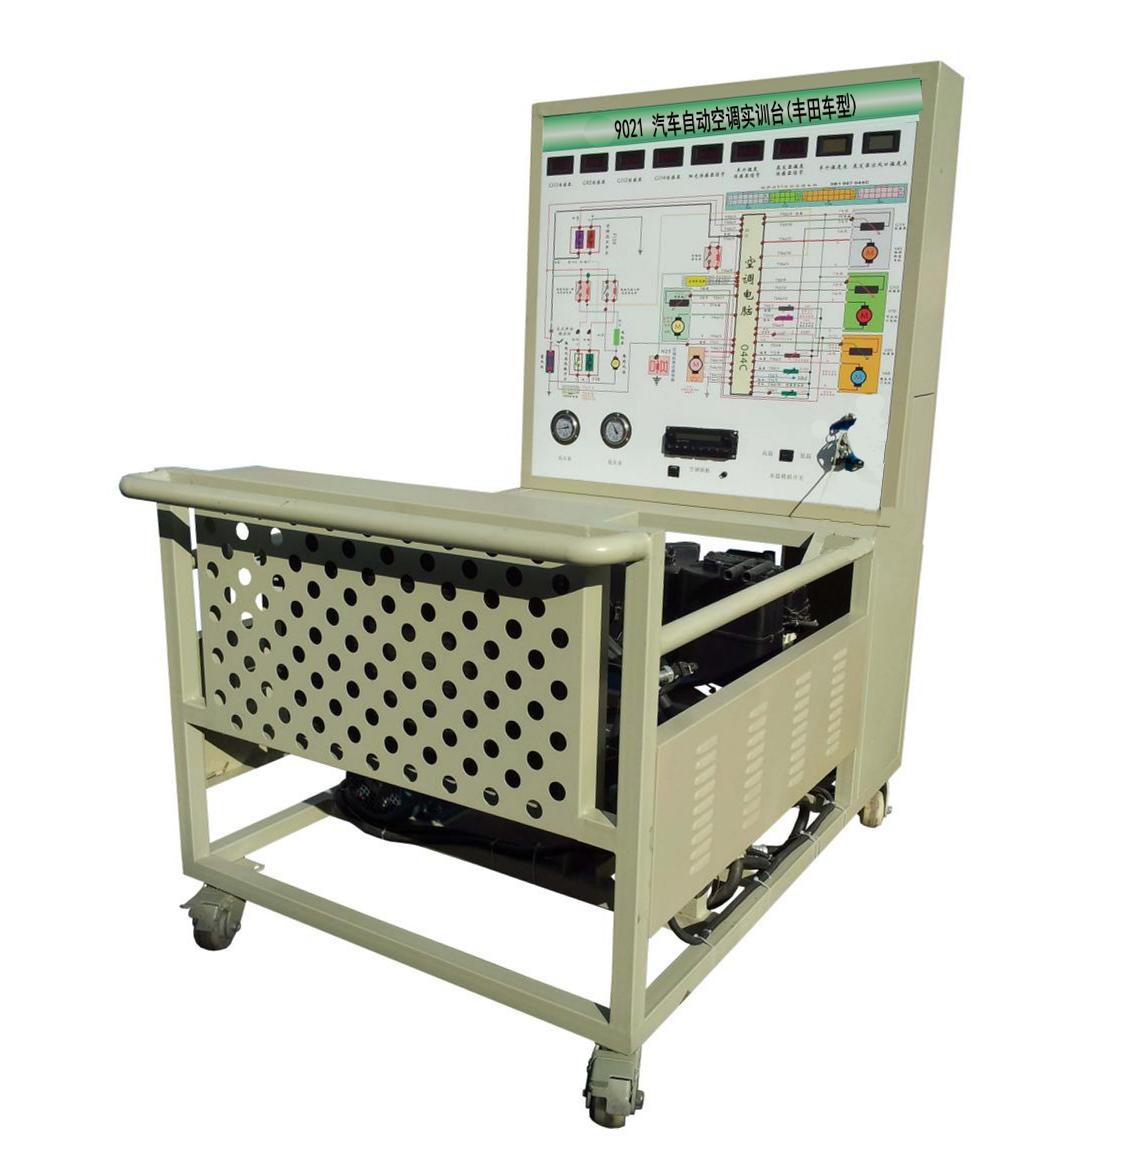 "ZY-9021 汽车自动空调实训台(丰田车型)  一、产品简介 汽车自动空调实训台(丰田车型)采用原汽车自动空调系统为基础,充分展示汽车自动空调系统组成结构和工作过程。 适用于中高等职业技术院校、普通教育类学院和培训机构对汽车自动空调系统理论和维修实训的教学需要。 本设备满足汽车职业教育的""五个对接十个衔接""的教学需要。 二、功能特点 1."